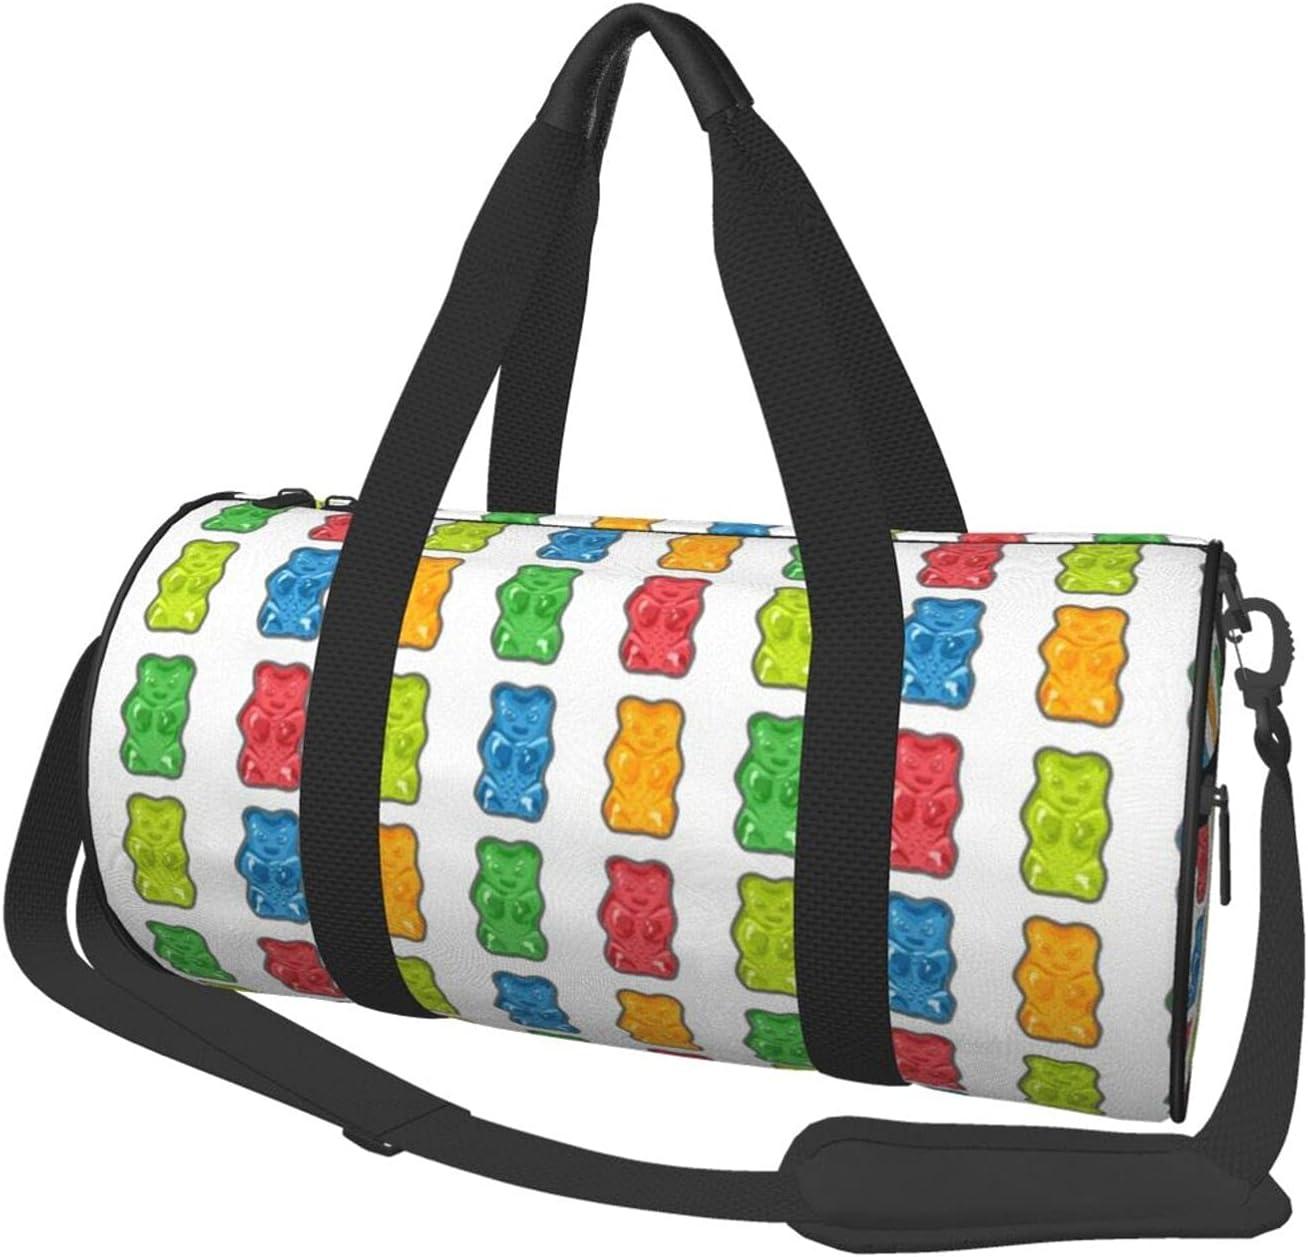 Round Sports Gym Bag Rainbow Should Handbag Yoga Bears Gummy Wholesale Max 44% OFF